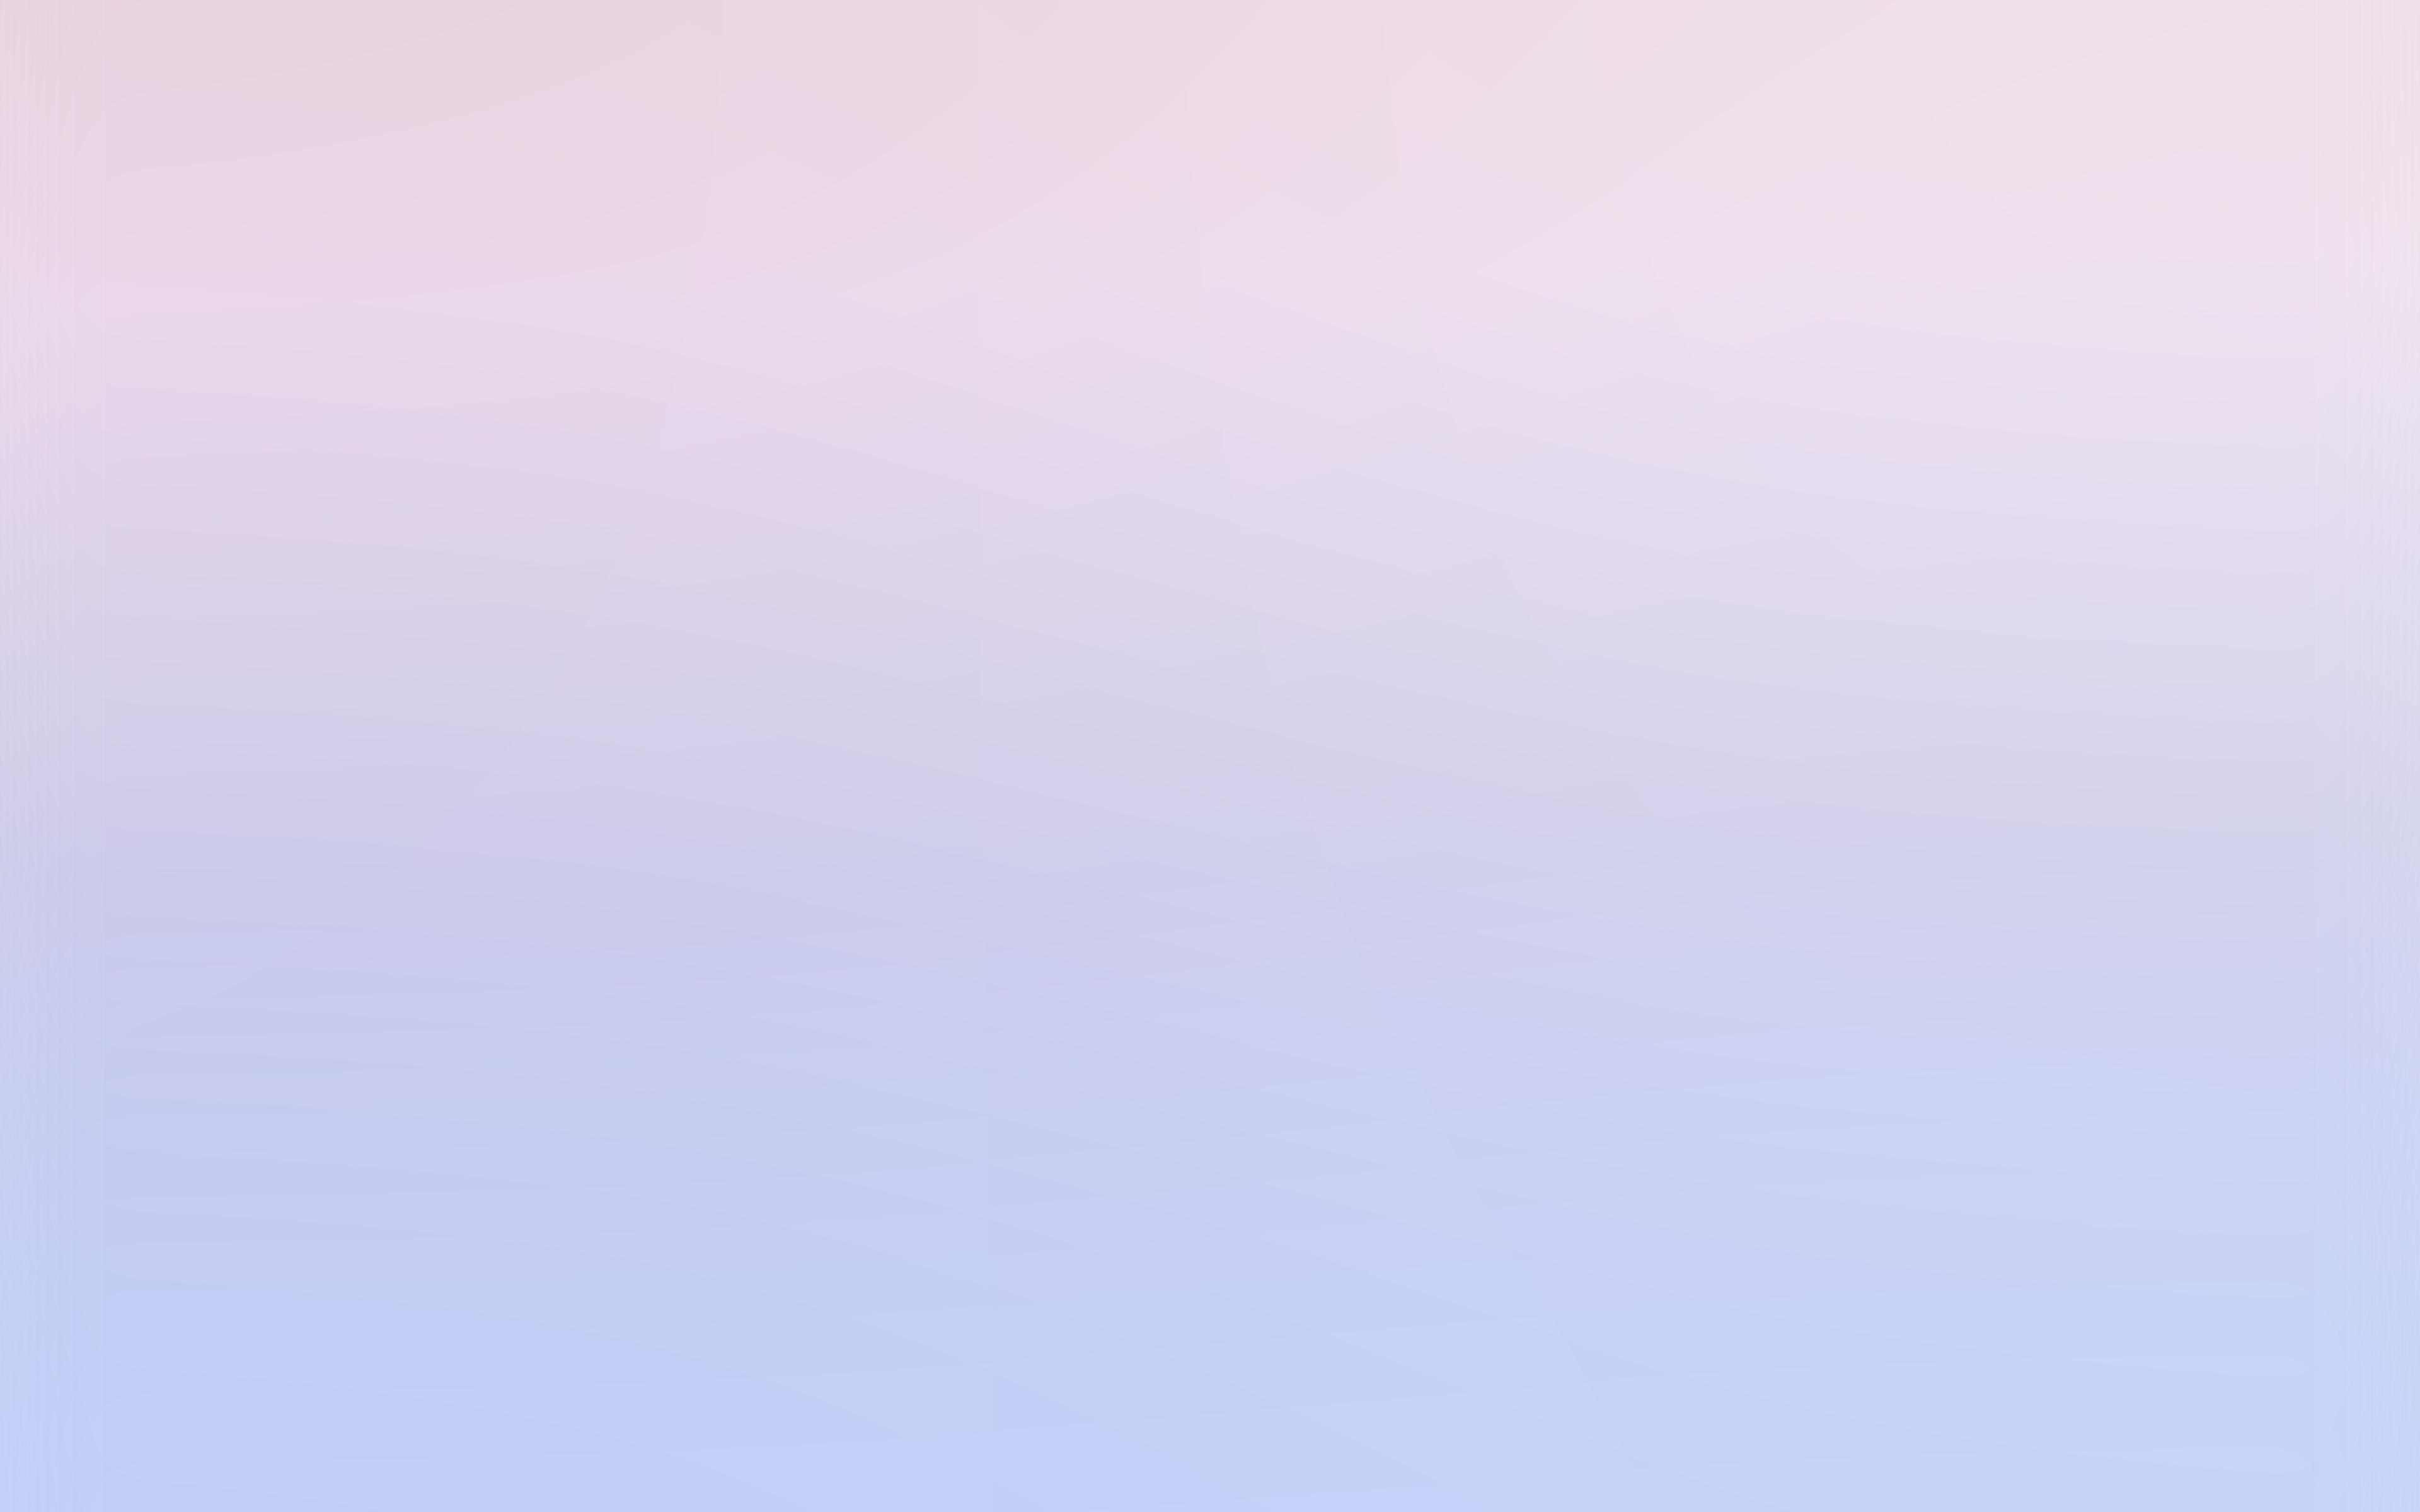 Fall Wallpaper Iphone Hd Sm55 Pastel Blue Red Morning Blur Gradation Wallpaper